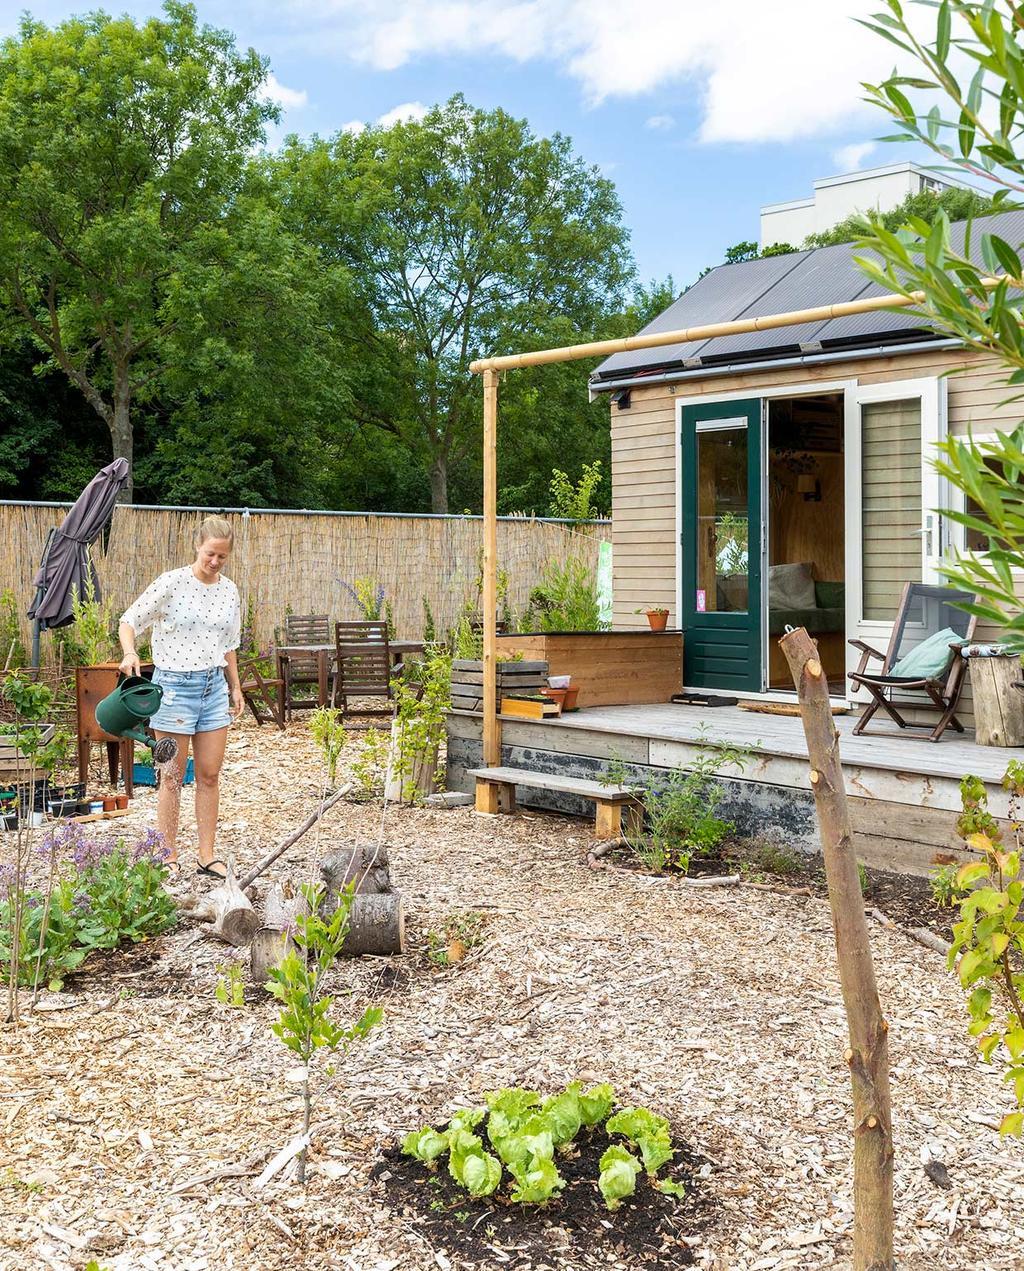 vtwonen special tiny houses | buiten bezig in tuin